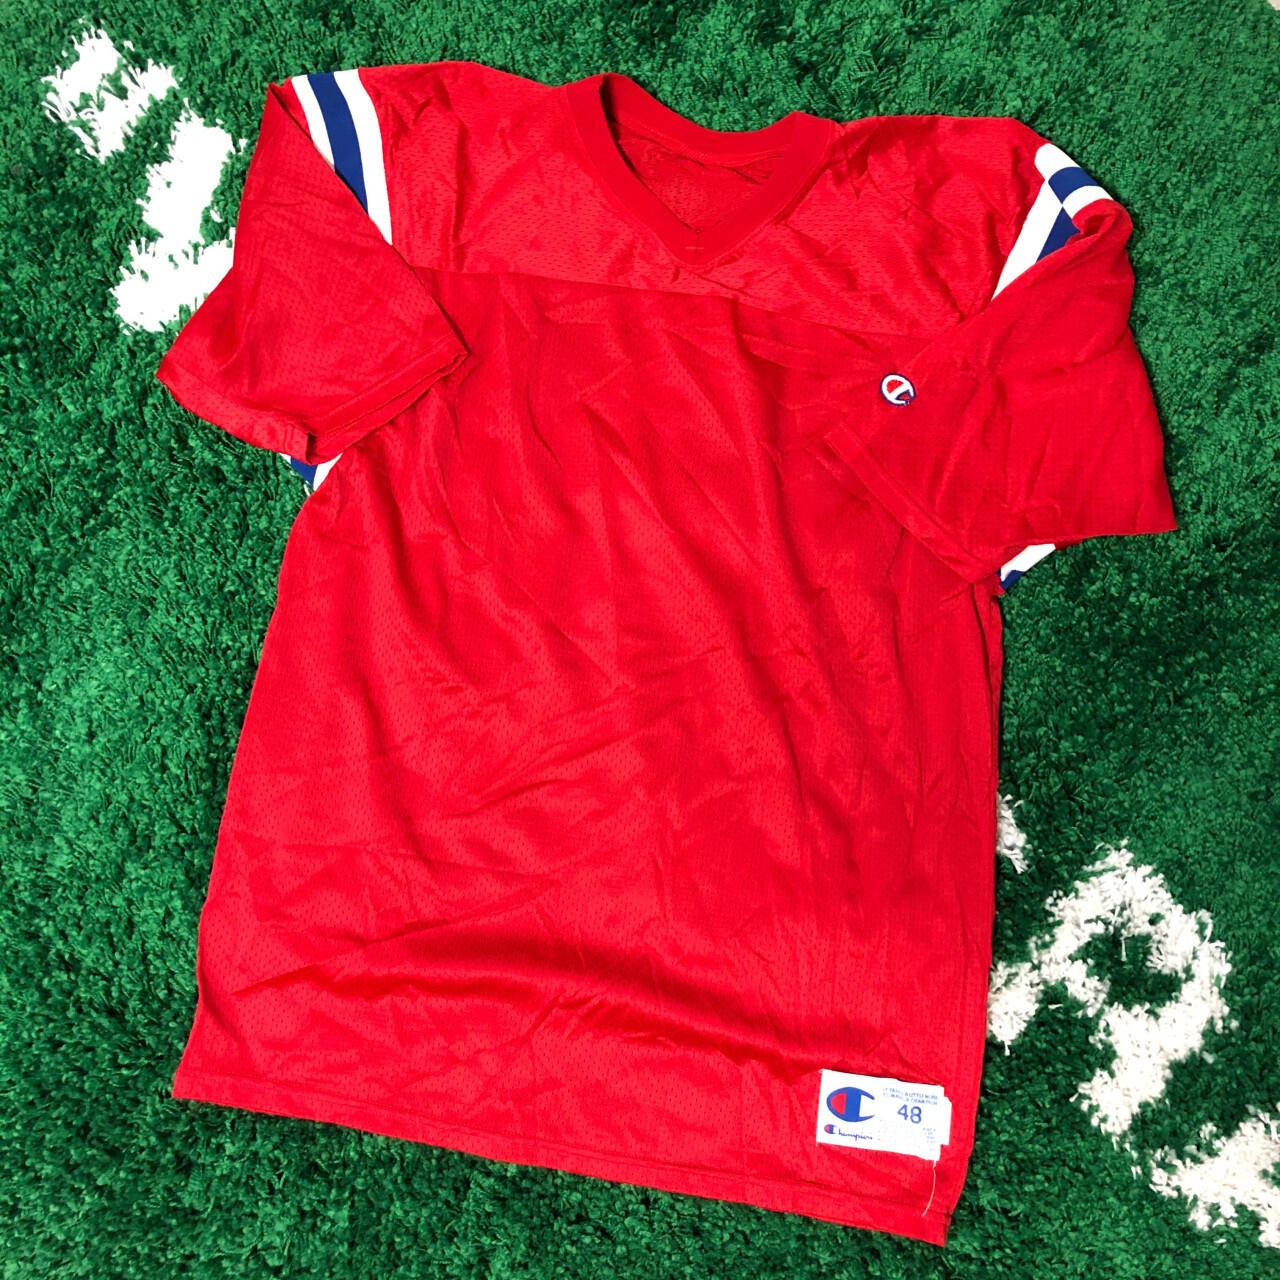 New England Patriots Champion Jersey Blank 90's Size XL